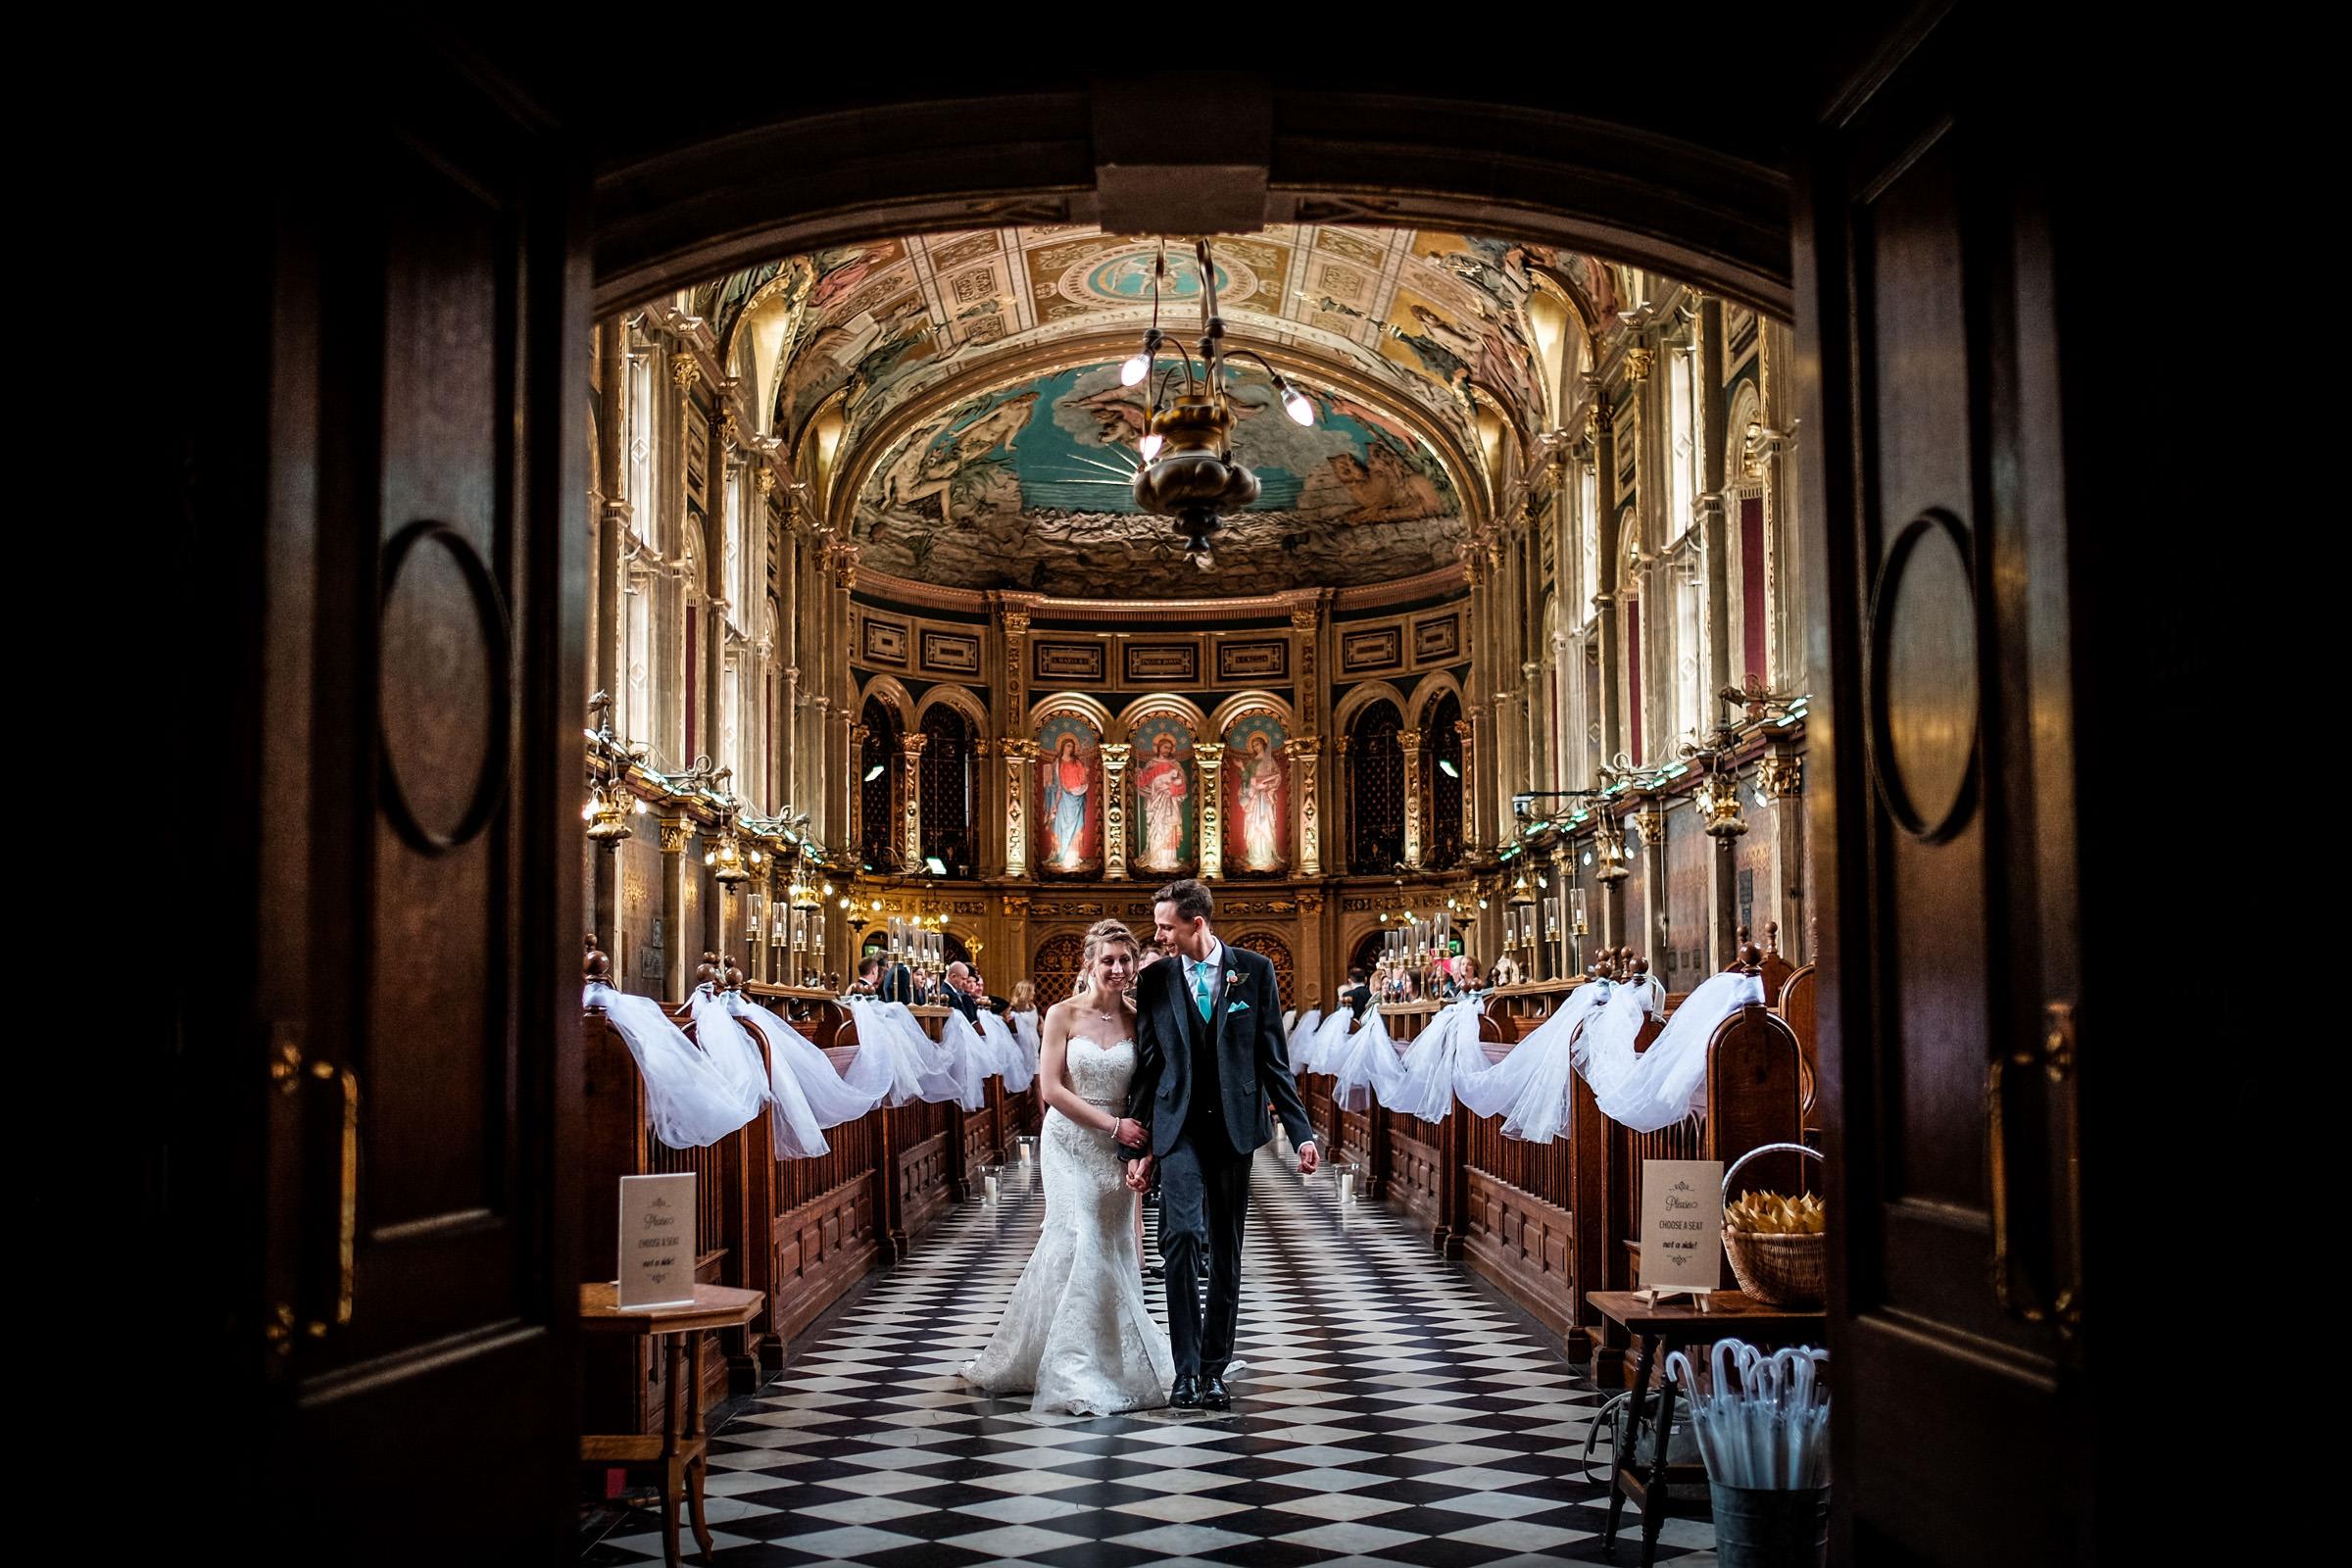 Wedding+at+Royal+Holloway+University+in+Surrey+015.jpg